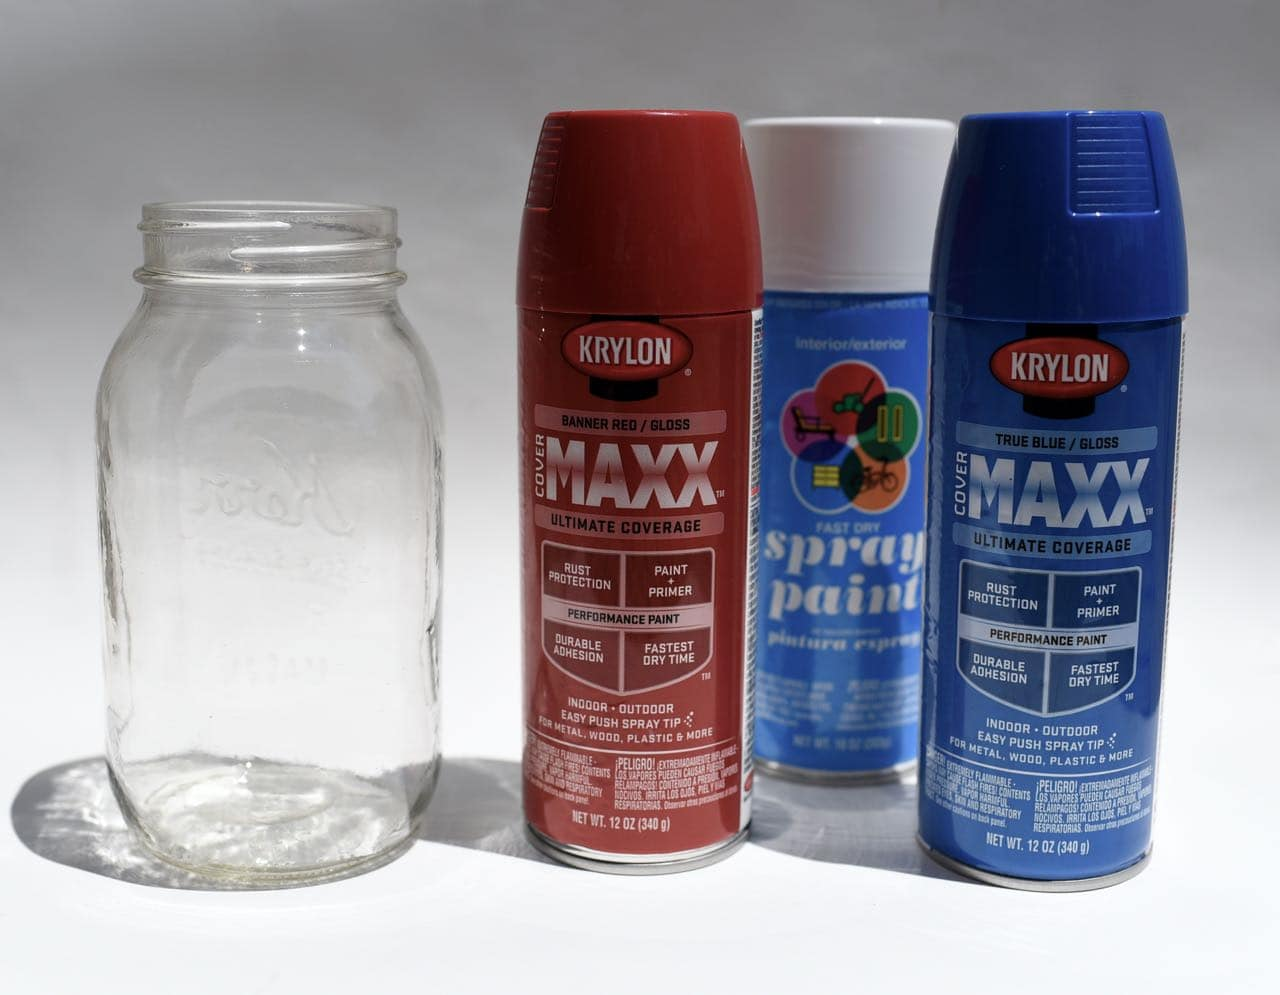 Krylon Maxx spray paint Fourth of July craft